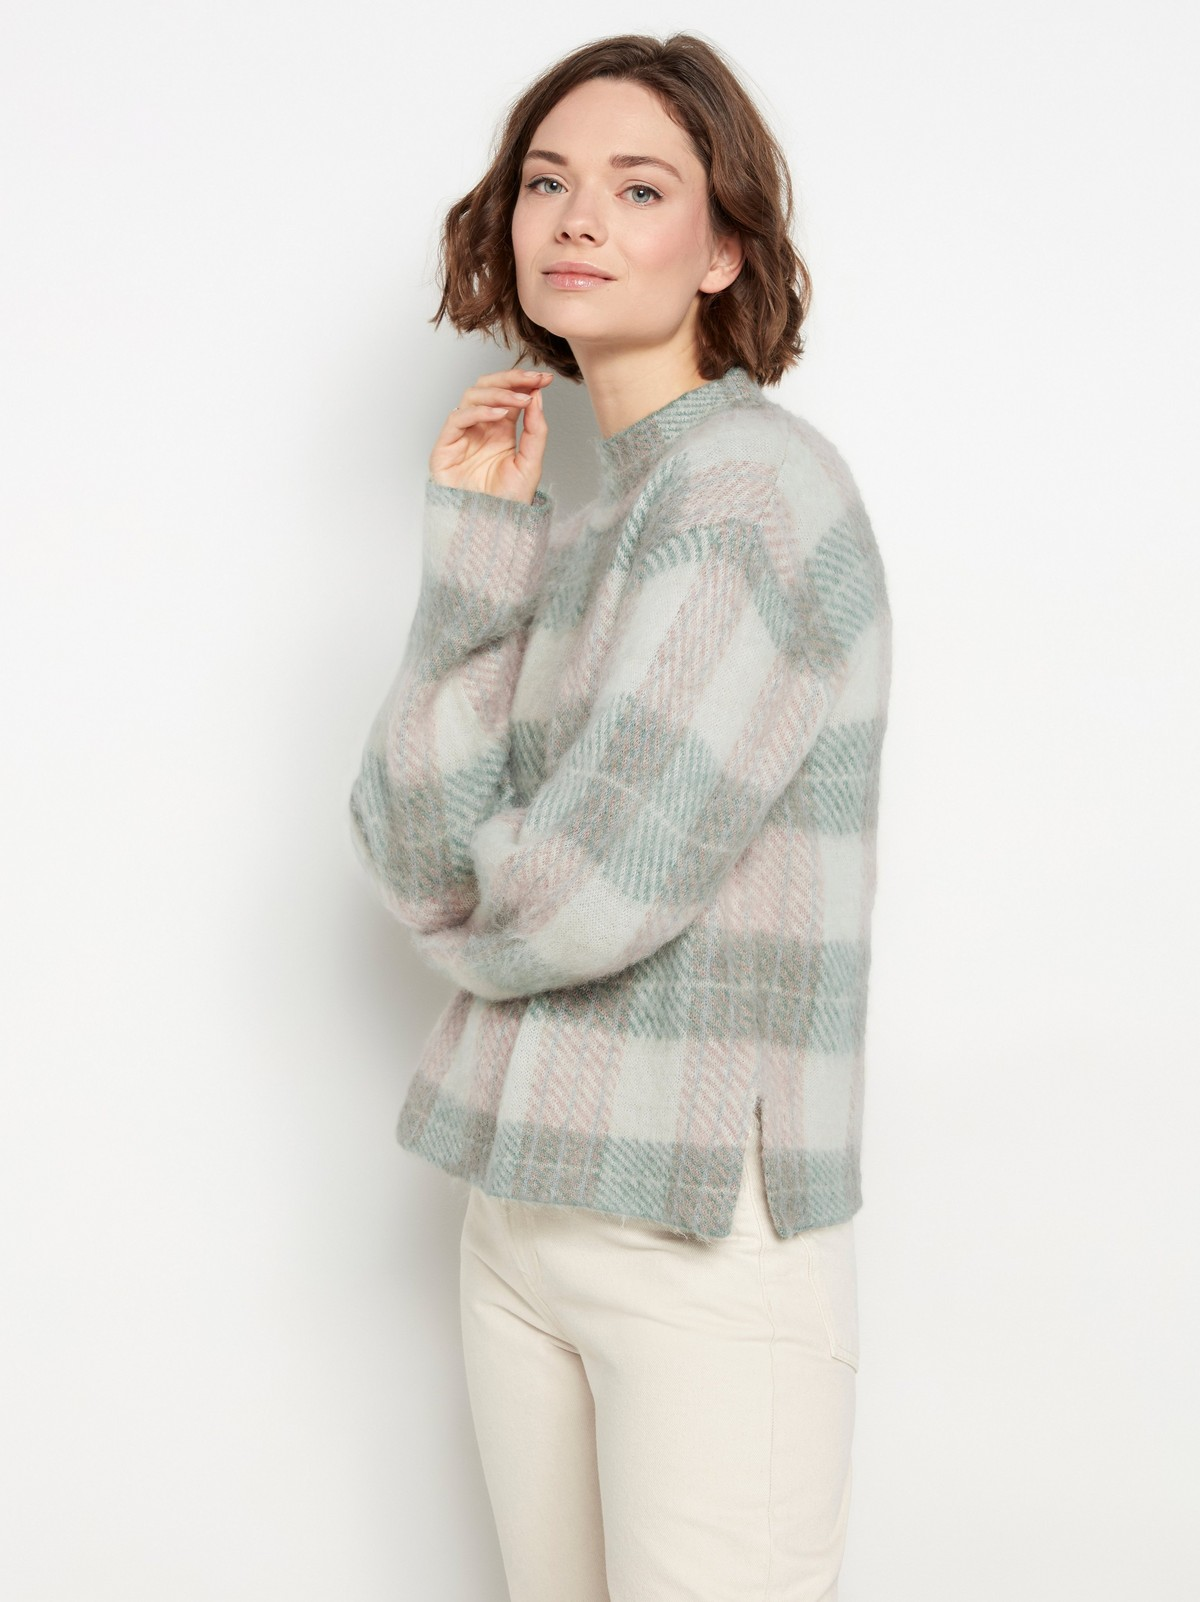 rutete genser strikk